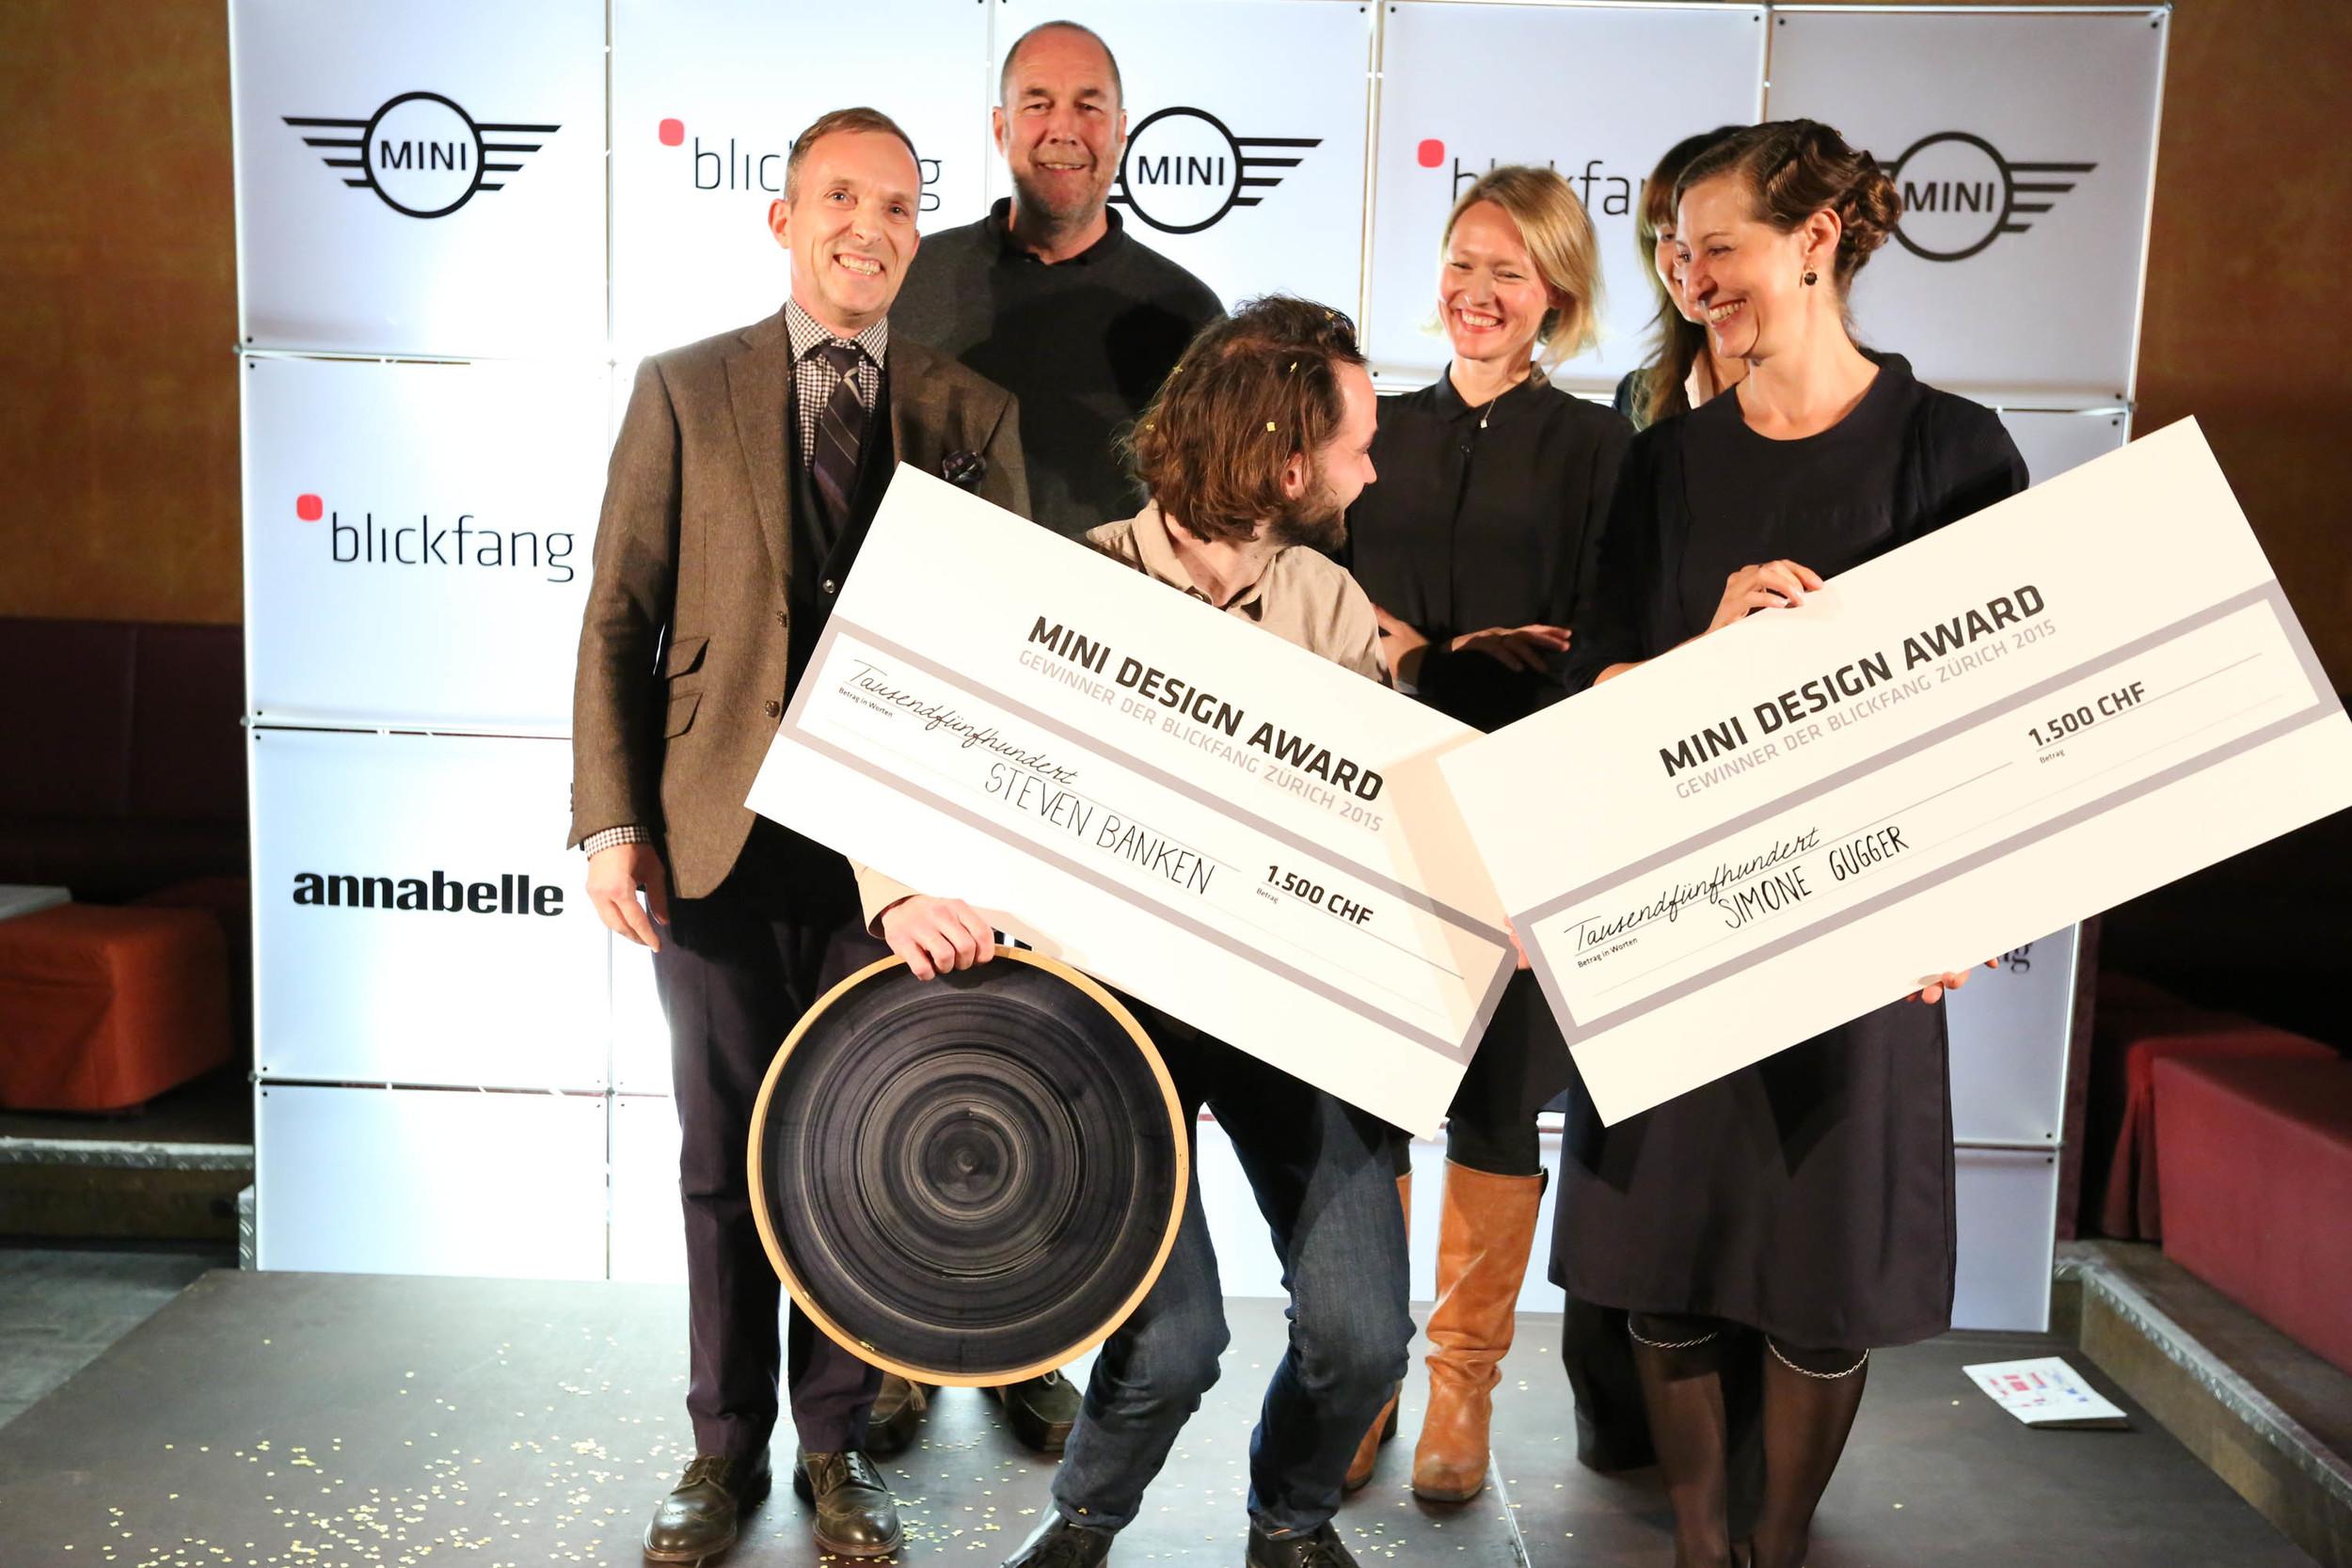 MINI-designpreis-der-internationalen-designmesse-blickfang-zuerich-2015-3.jpg